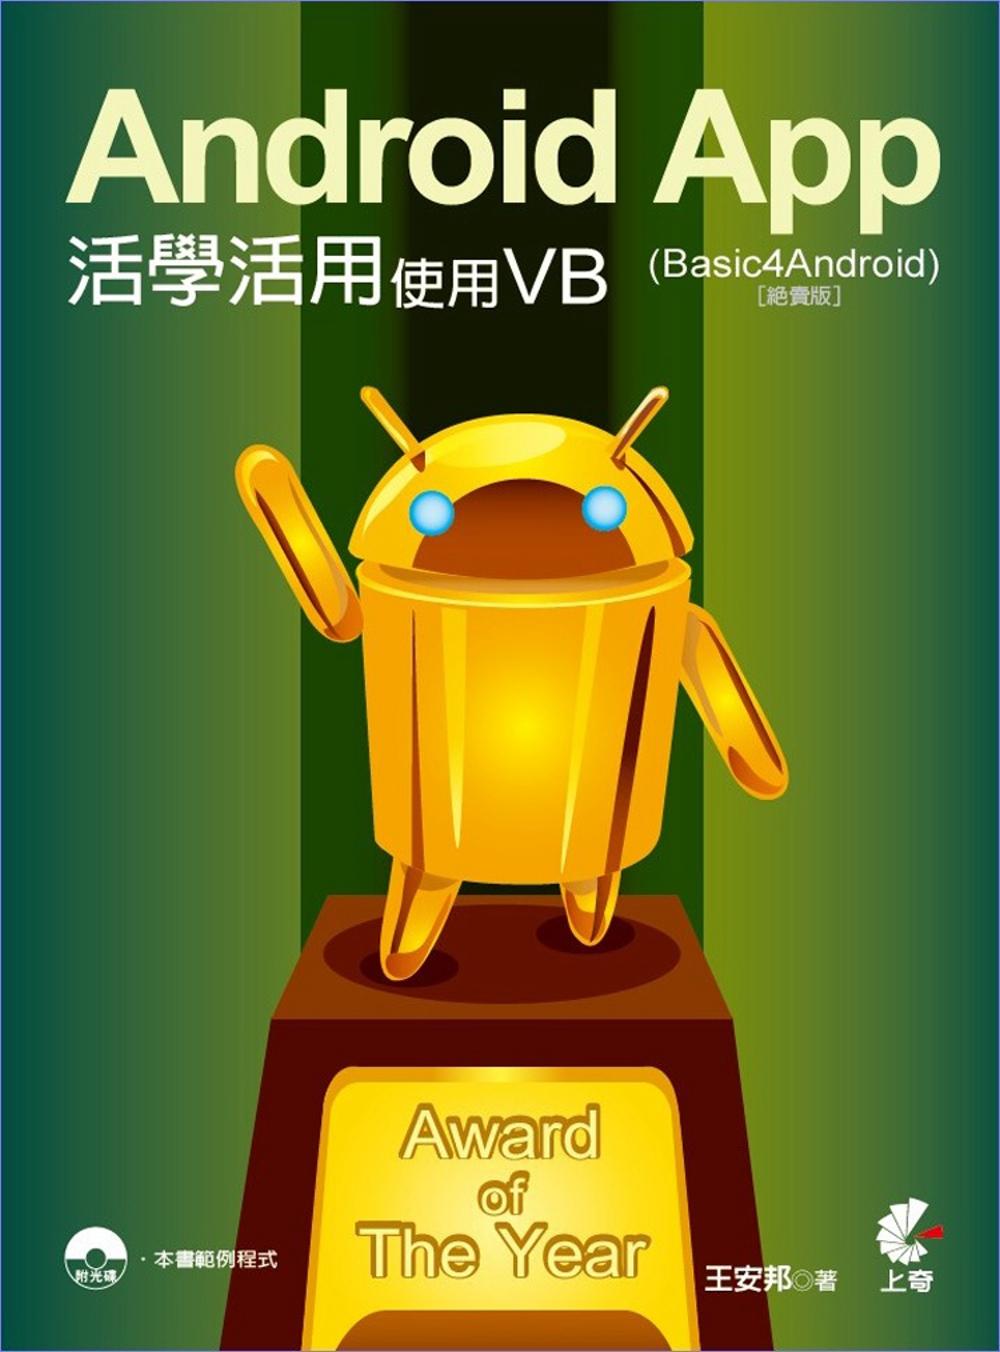 Android App活學活用:使用VB (Basic4Android)(絕賣版)(附光碟)